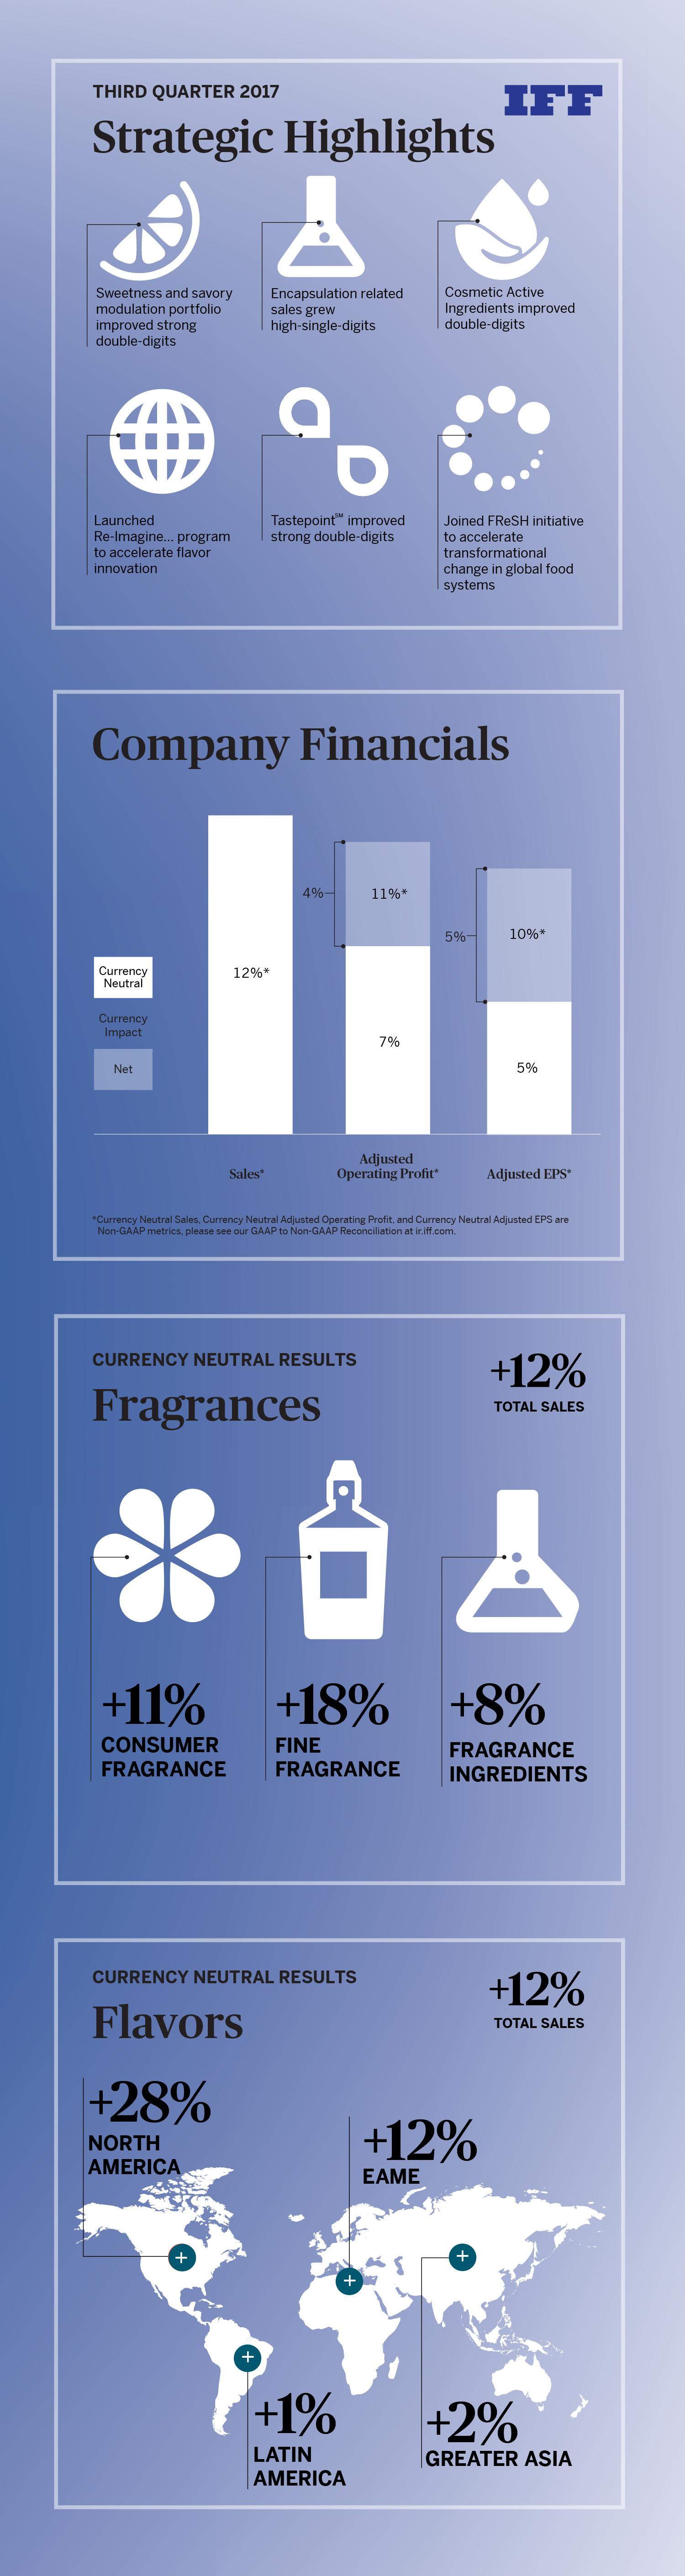 International Flavors Fragrances Cut Jobs Profit - Year of